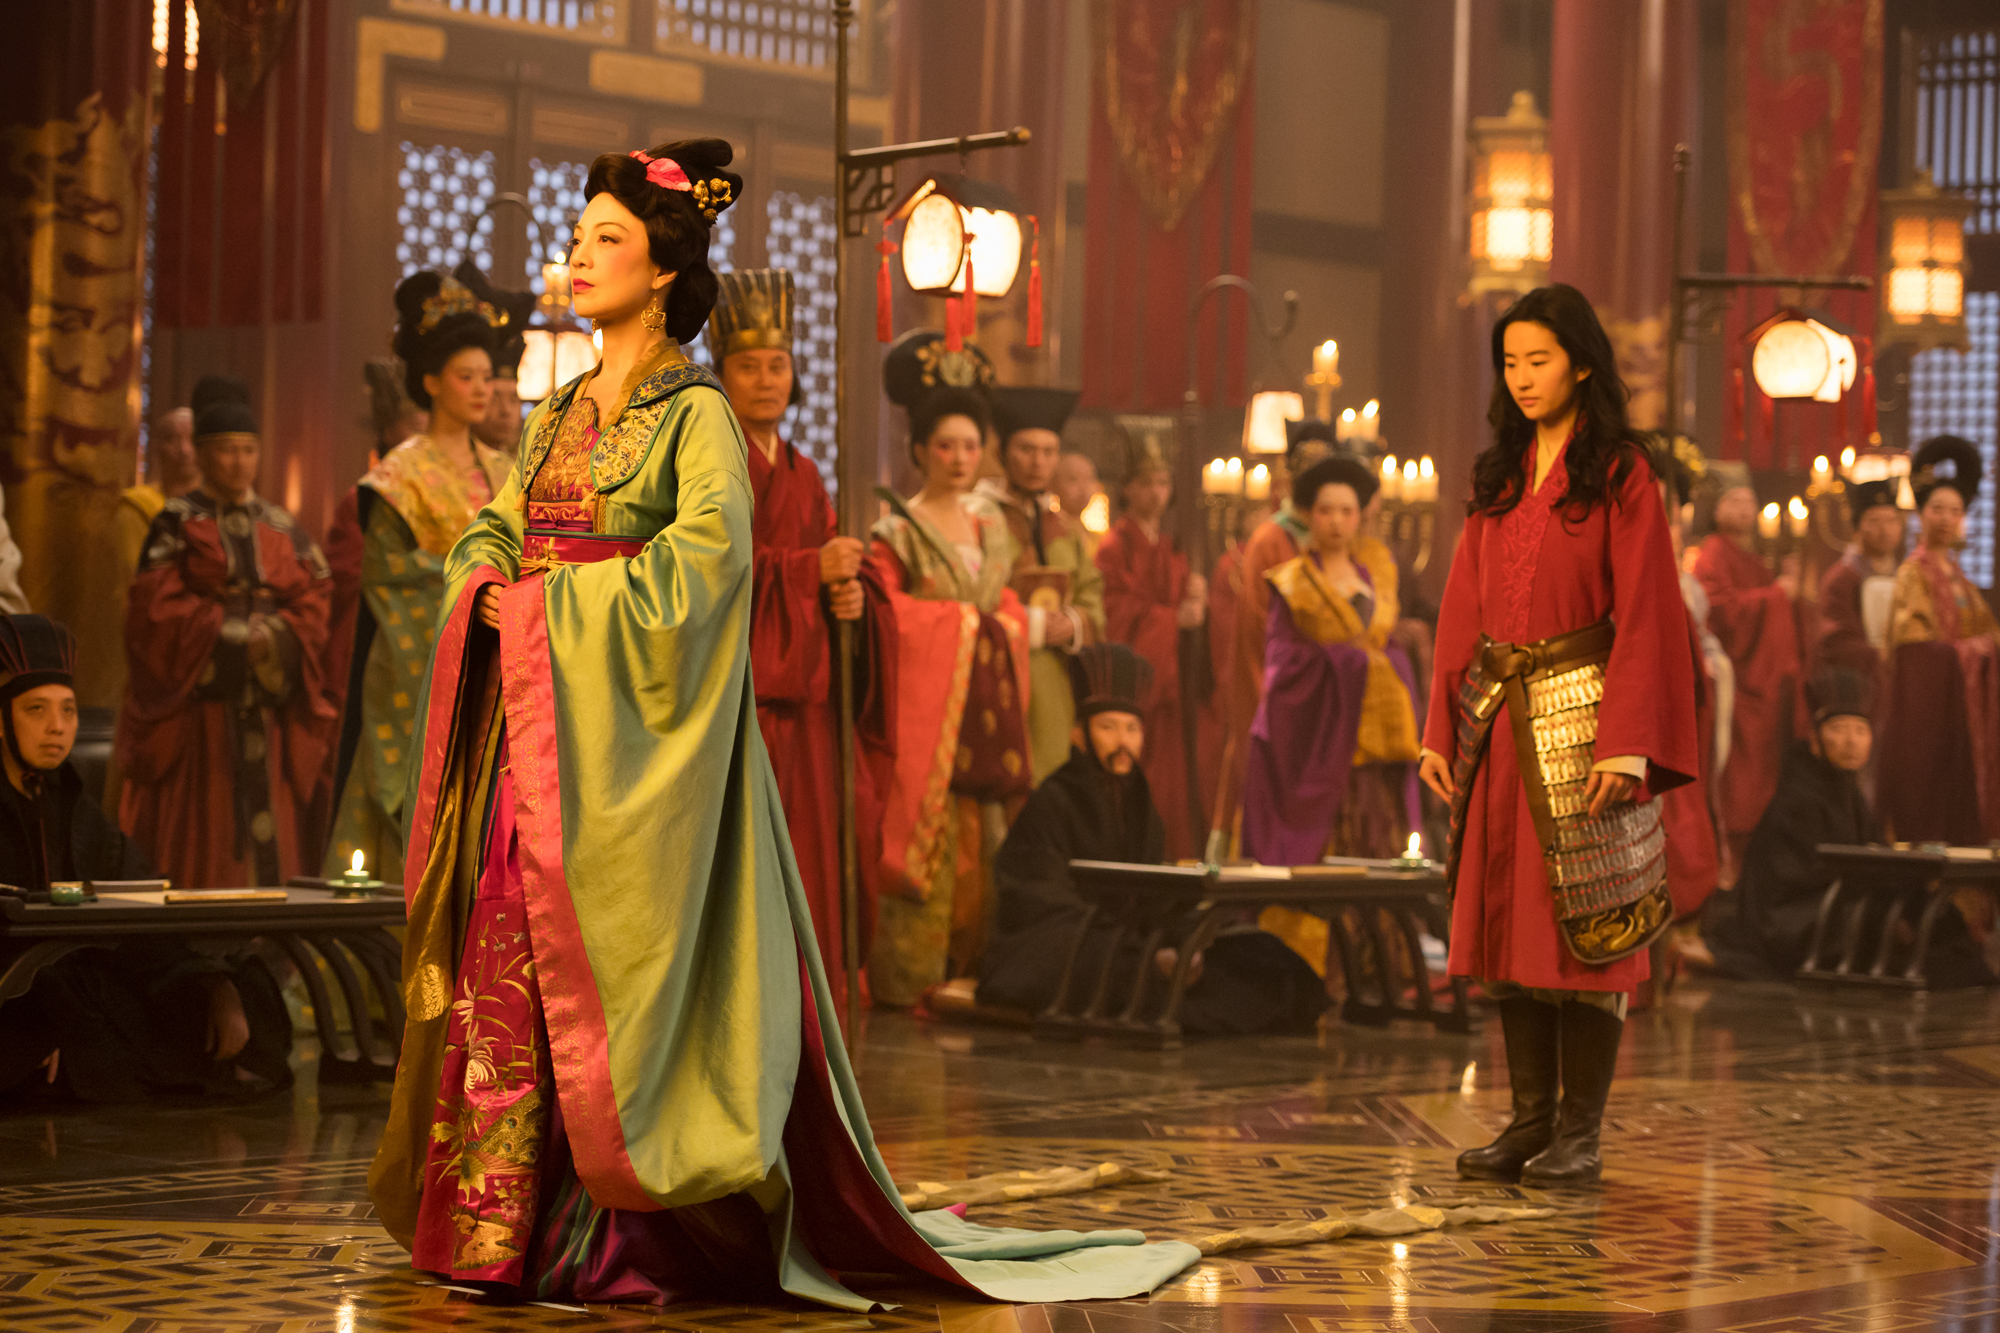 Ming-Na Wen and Yifei Liu in Disney's MULAN